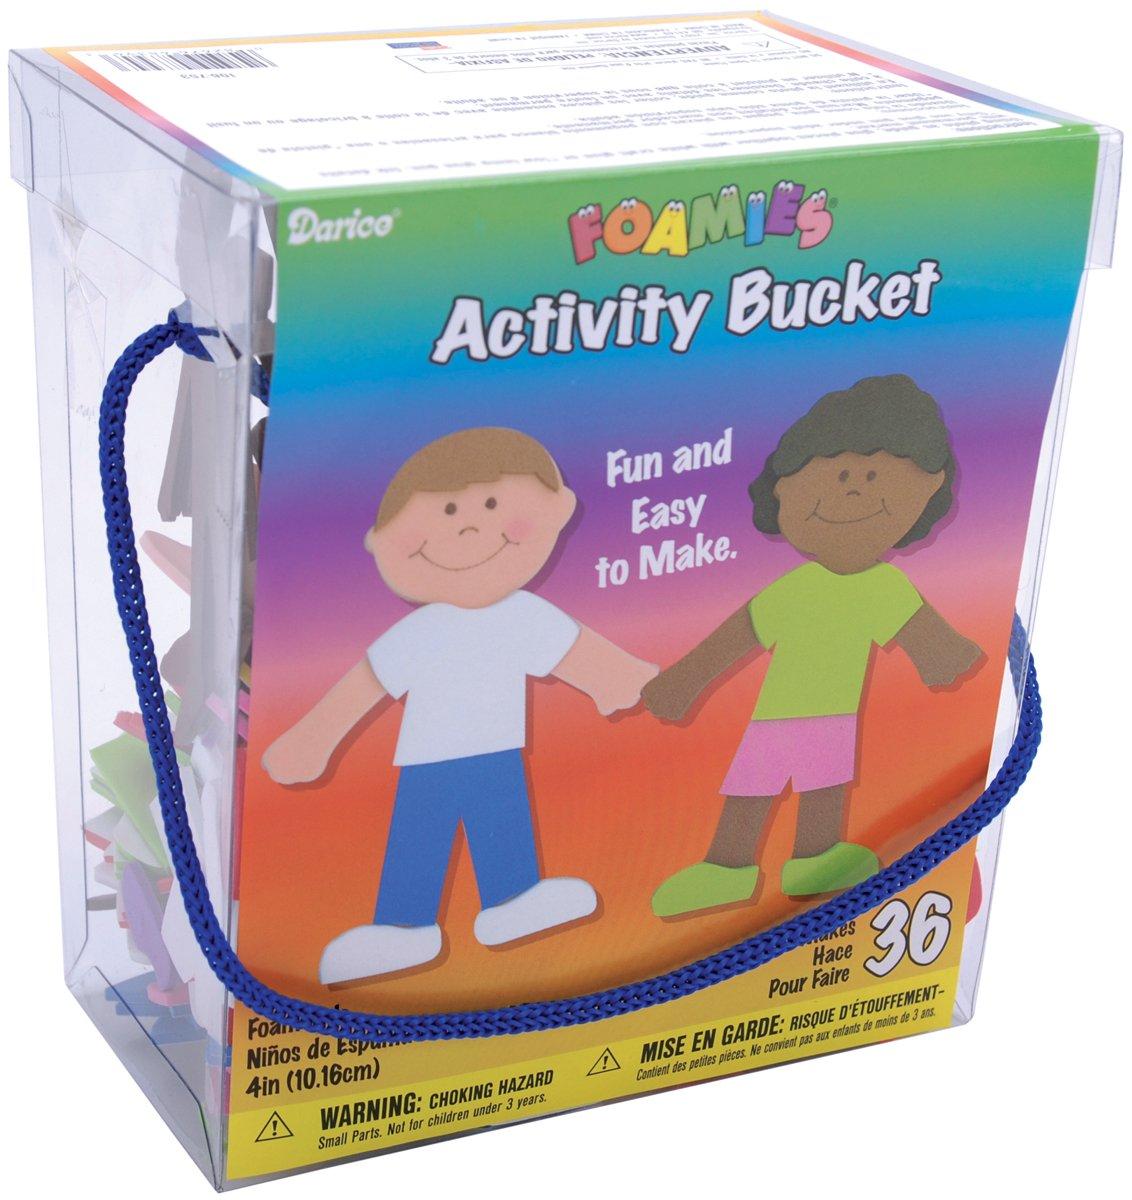 Darice Activity Foamies Bucket of Tribal Turtles